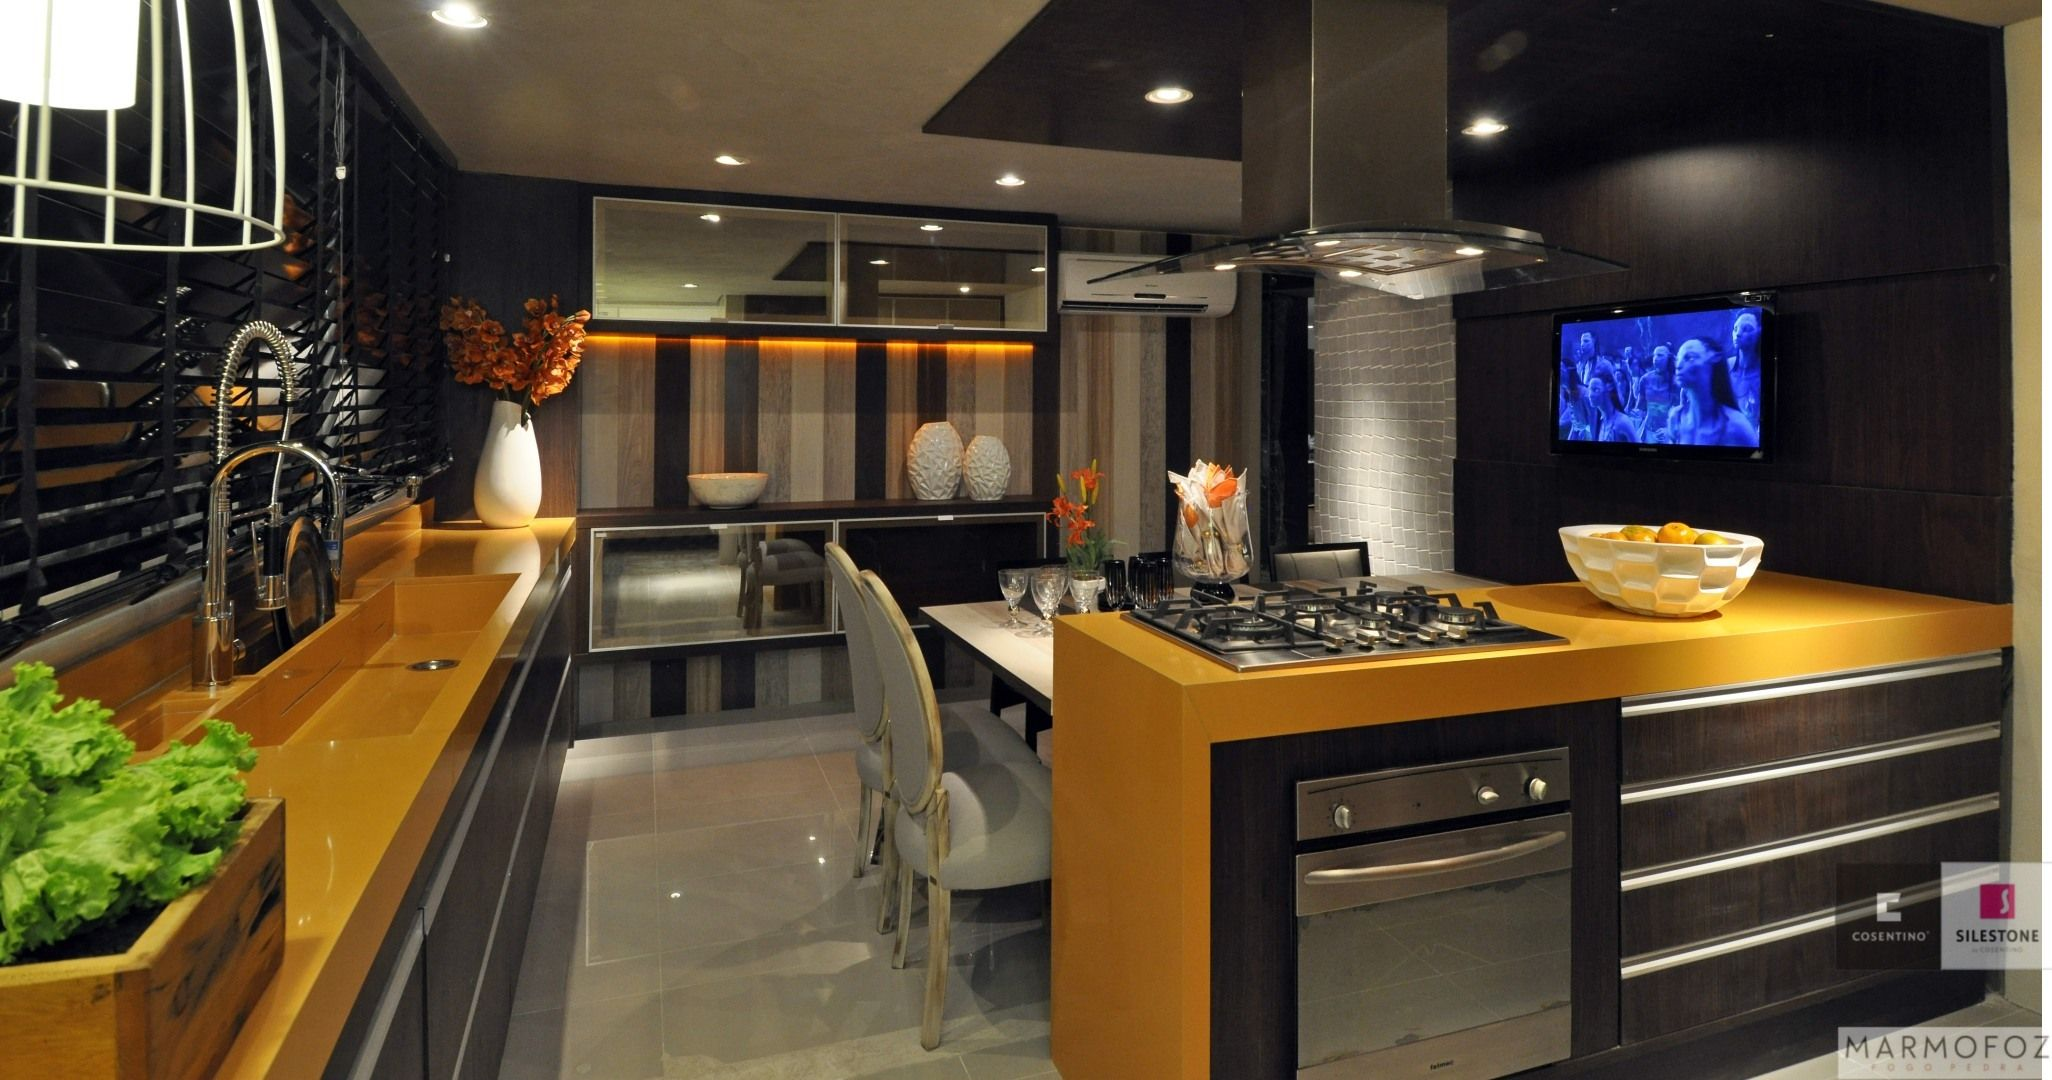 Bancadas de silestone amarelo pesquisa google cozinhas - Bancadas de cocina ...